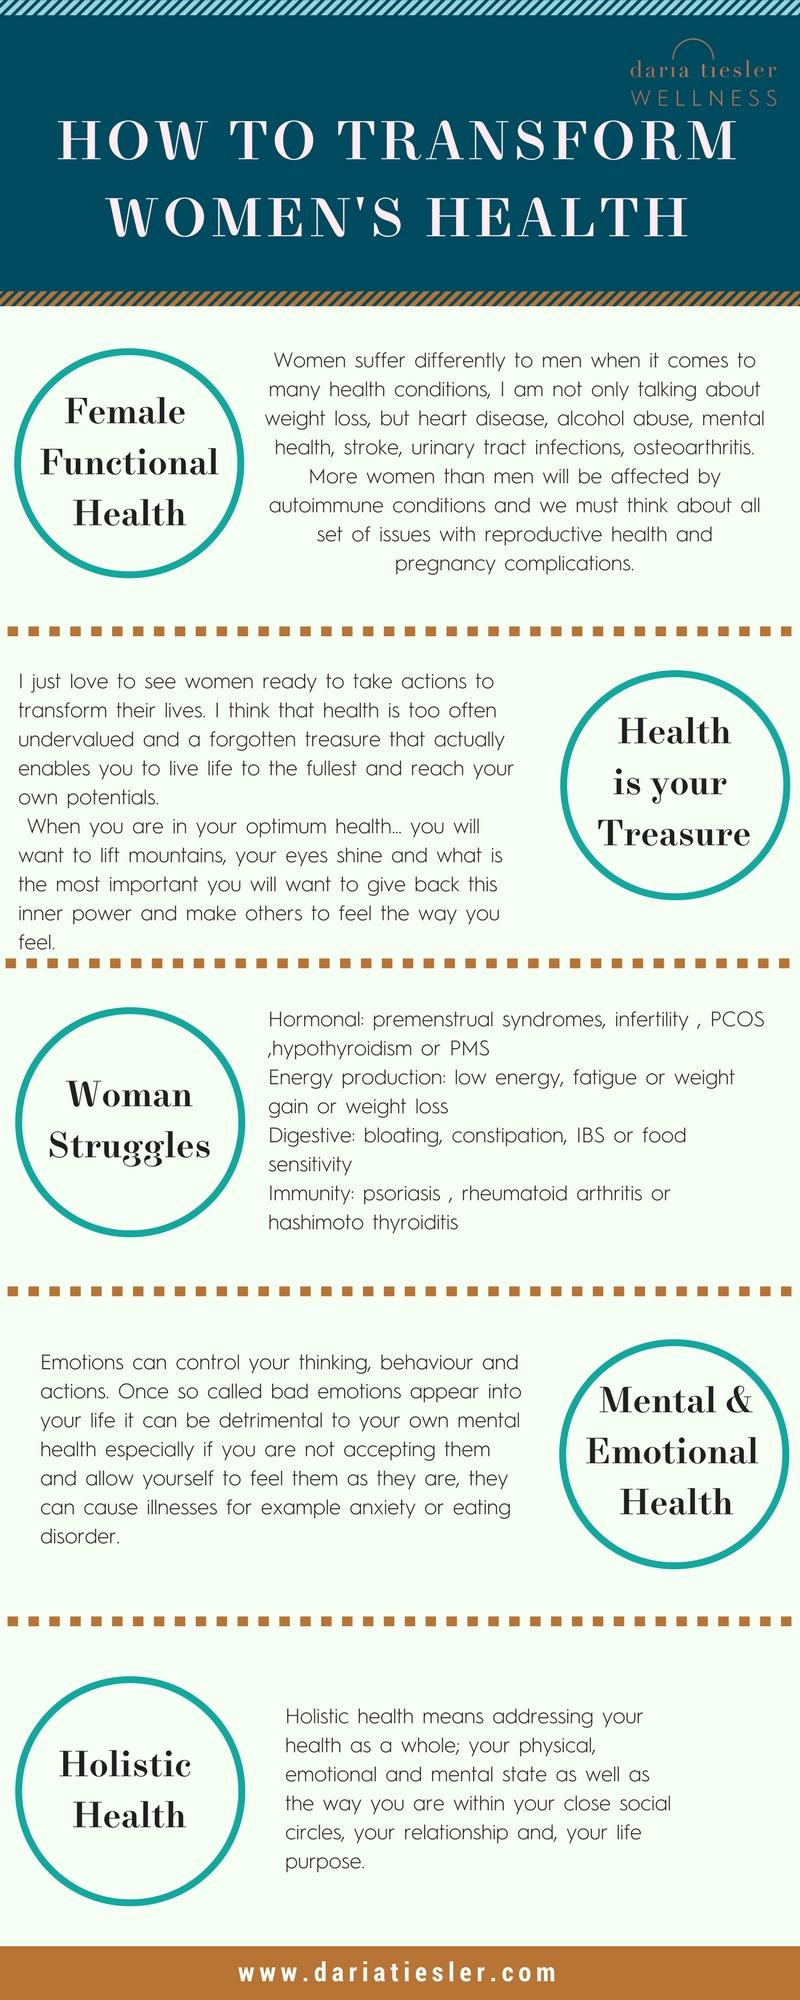 how-to-trasnform-womens-health.jpg